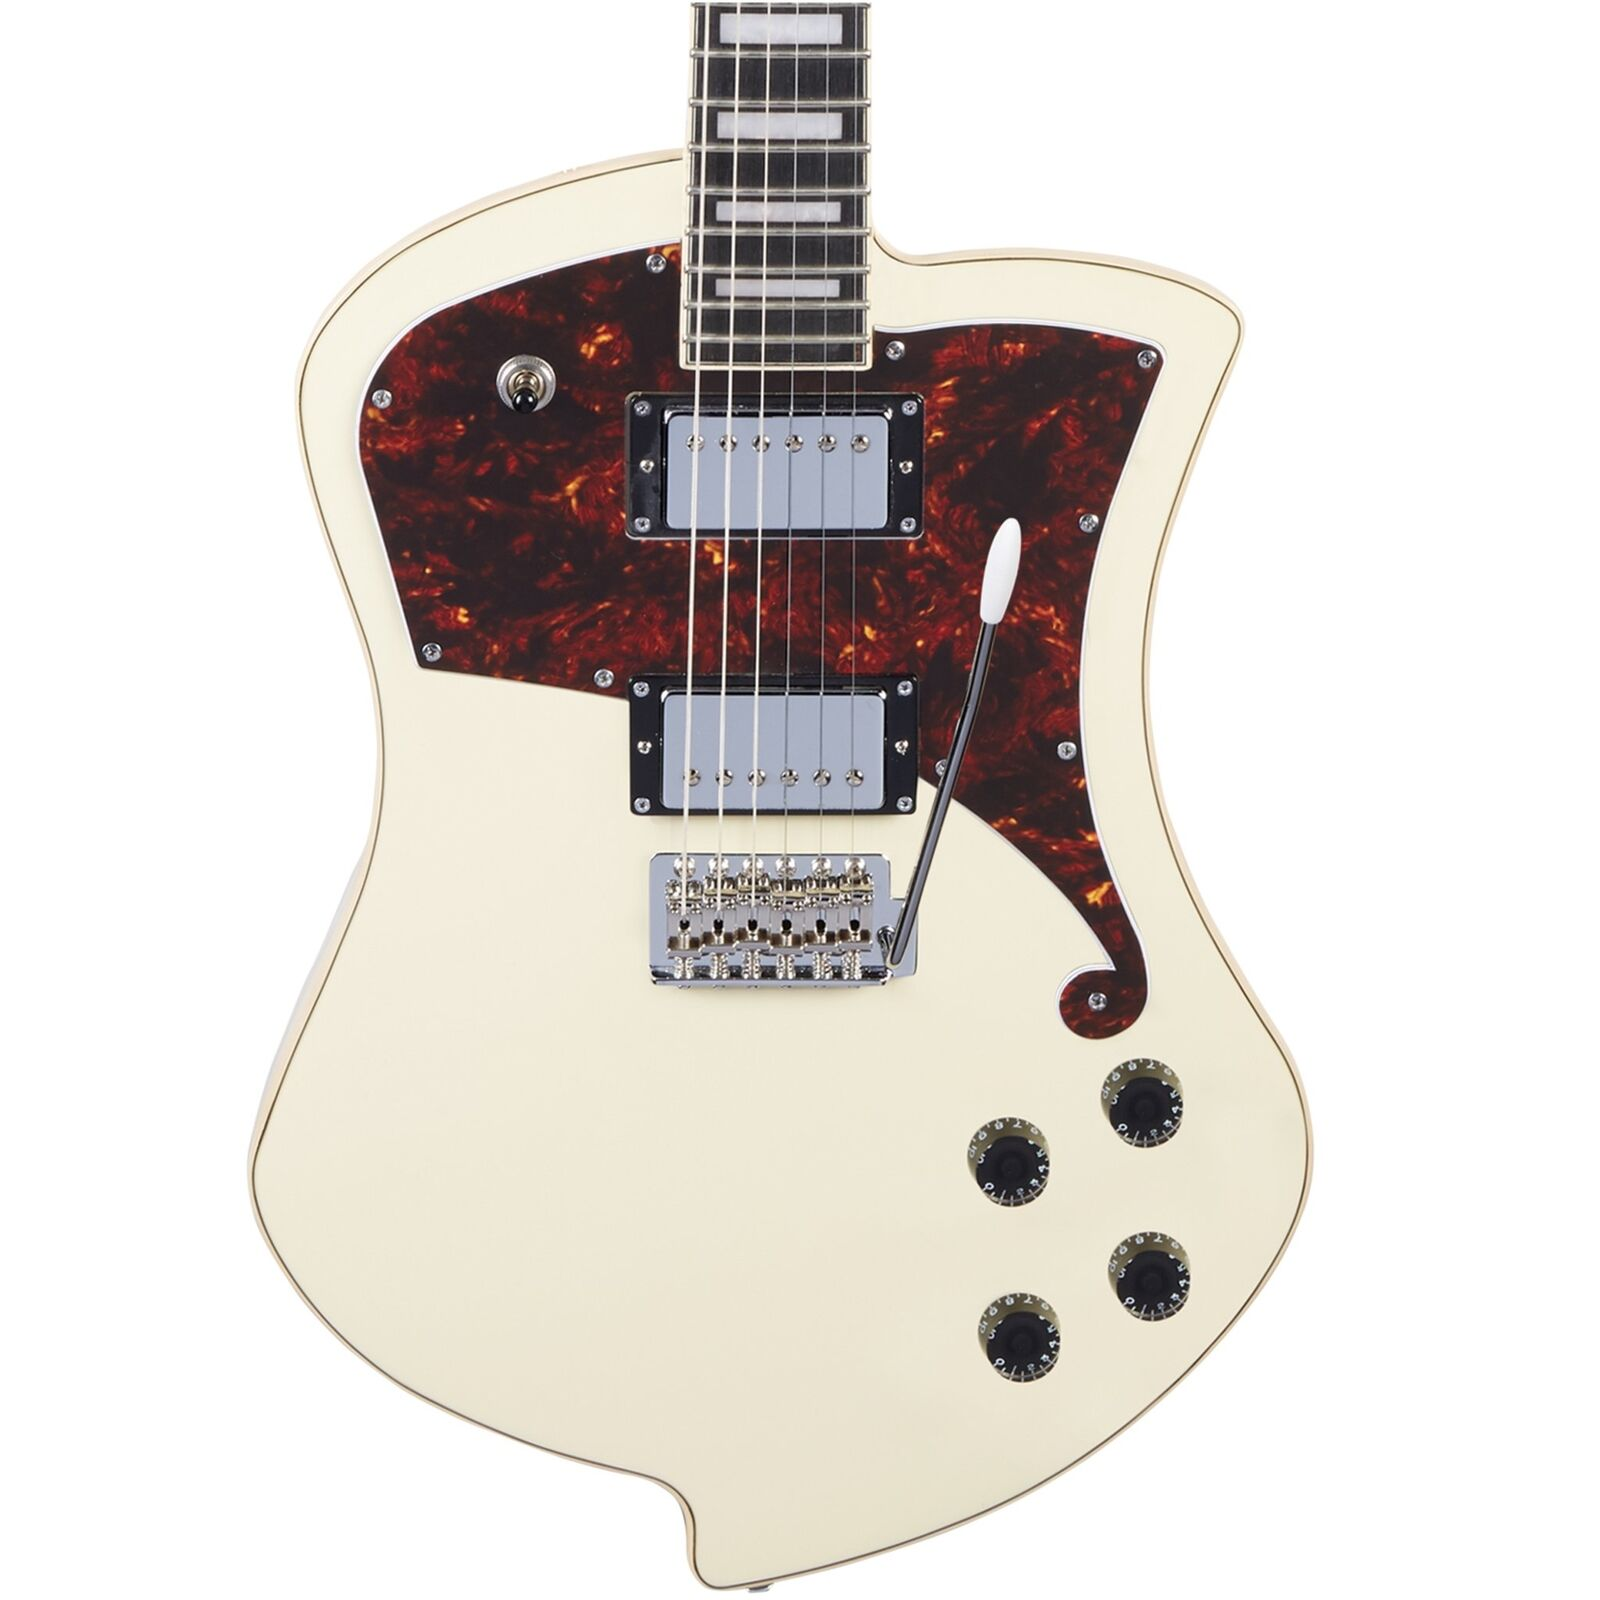 D'Angelico Premier Series Ludlow Electric Guitar w Bag-Vintage Weiß